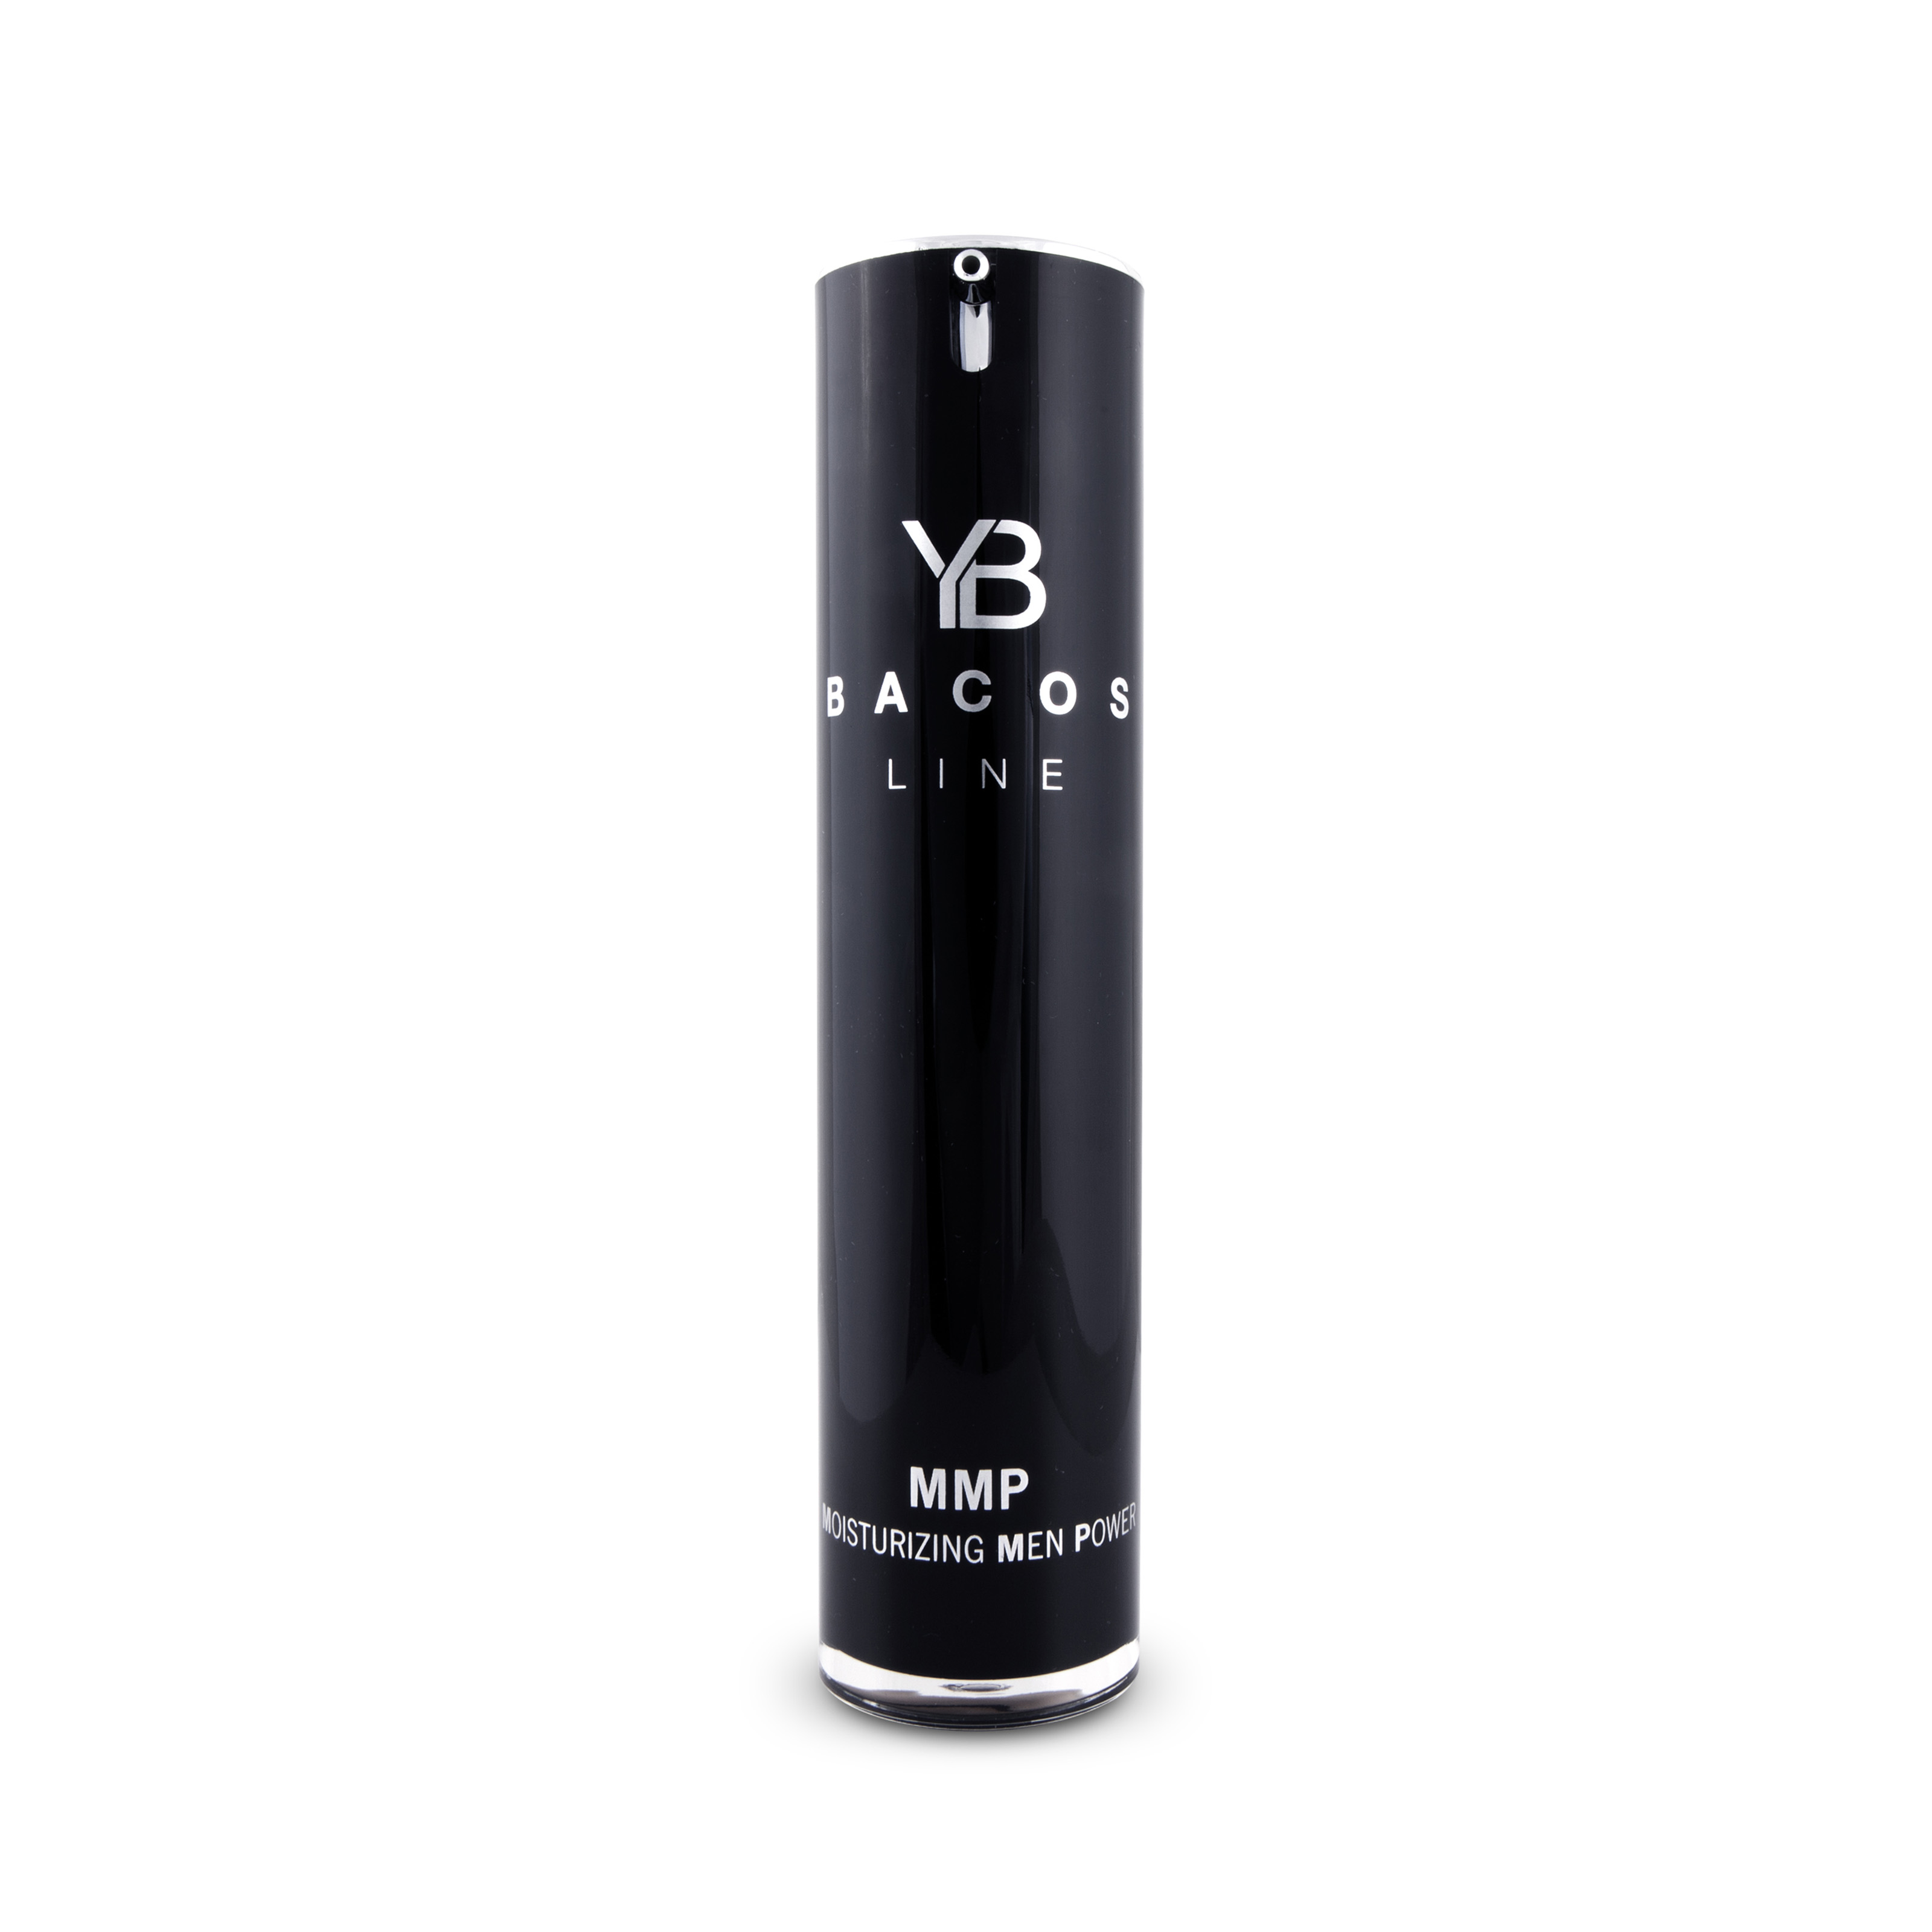 YB BACOS LINE MMP MOISTURIZING MAN POWER 50 ML